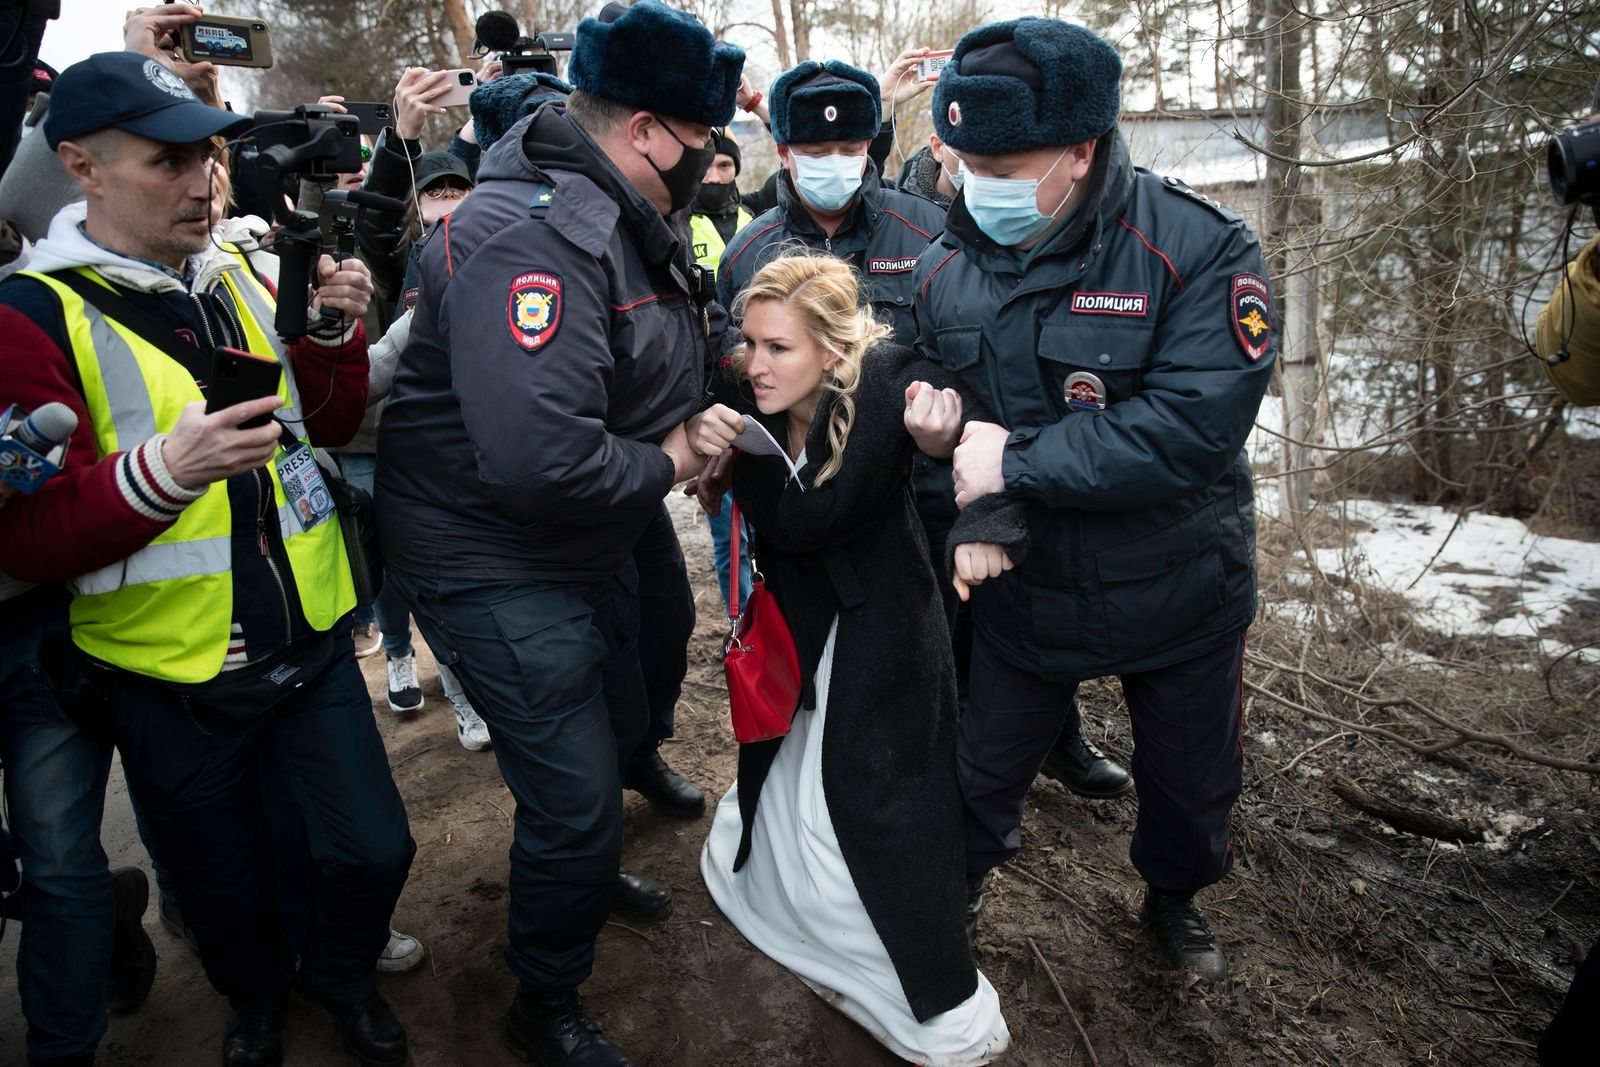 Russische Ärzte an Nawalnys Straflager bekommen keinen Zugang